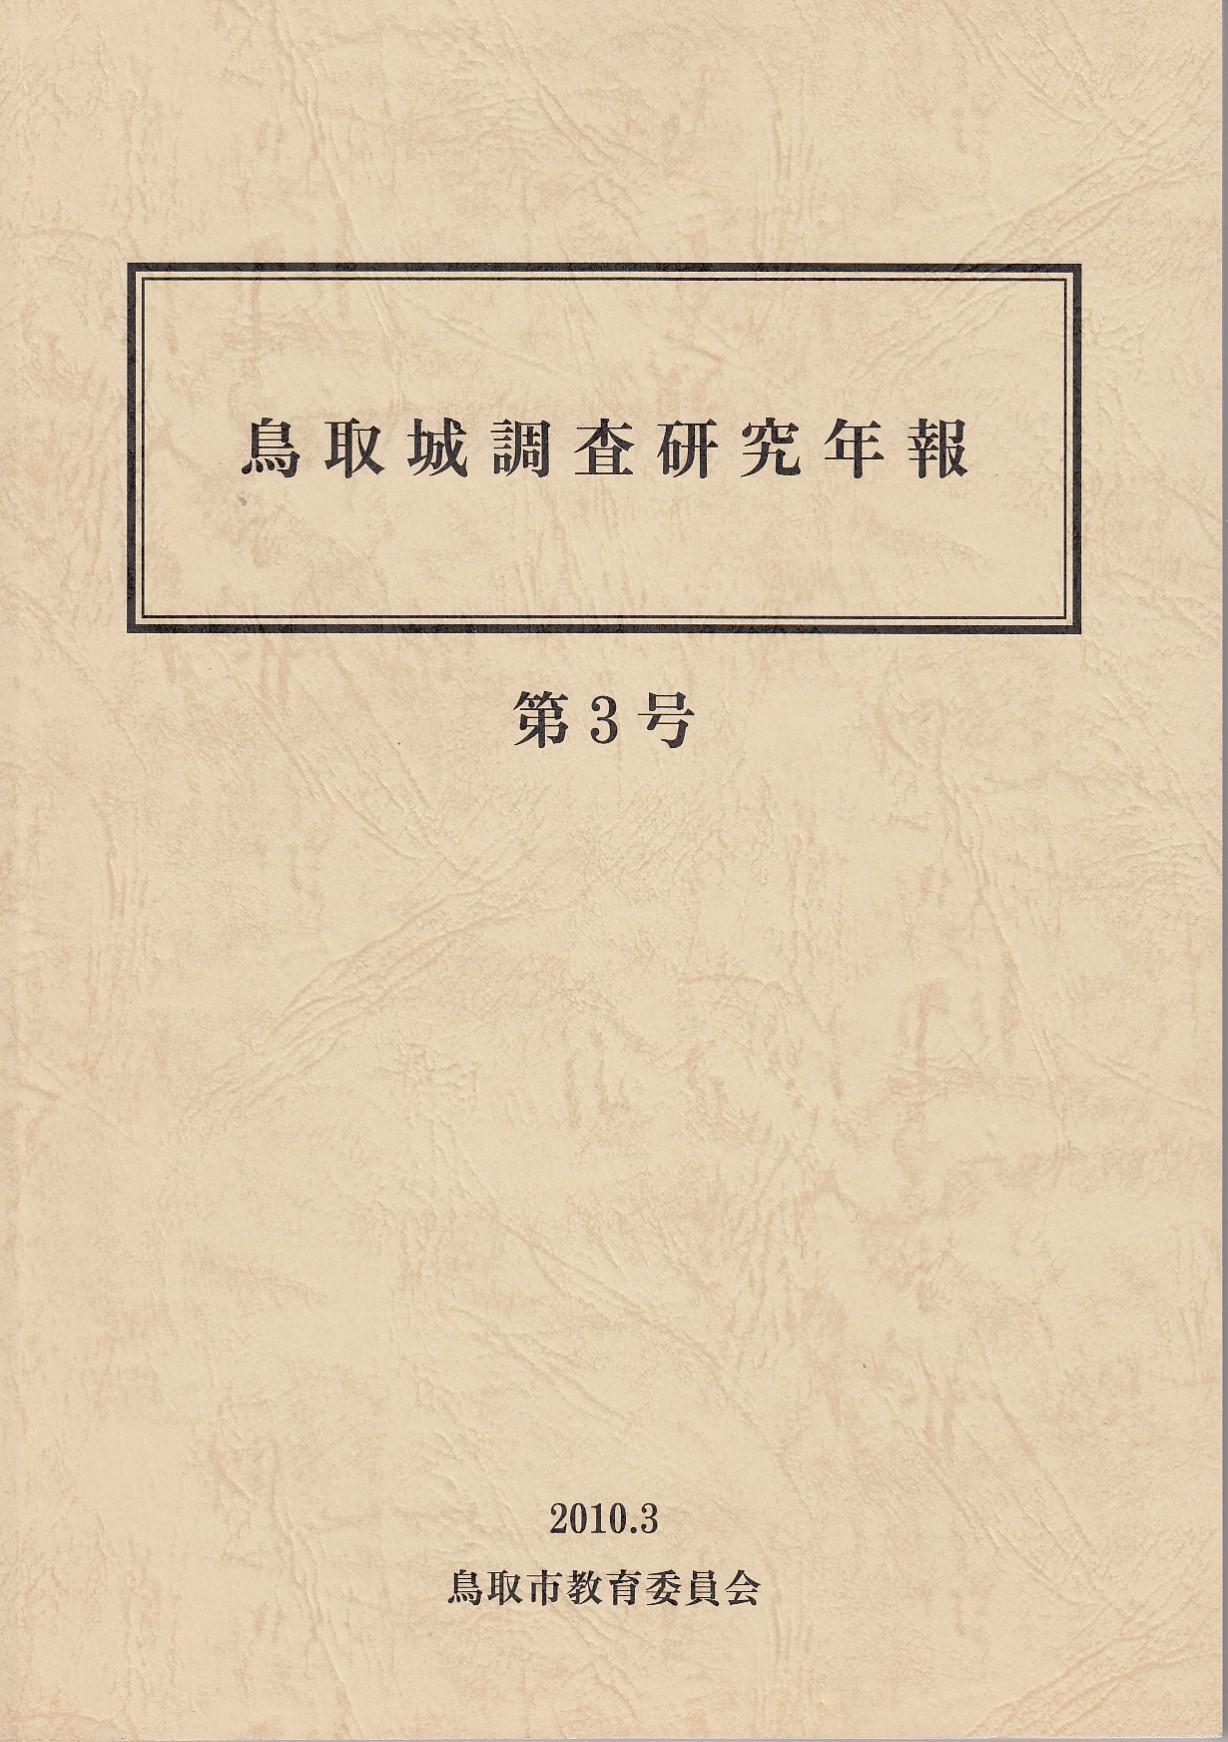 No-0153